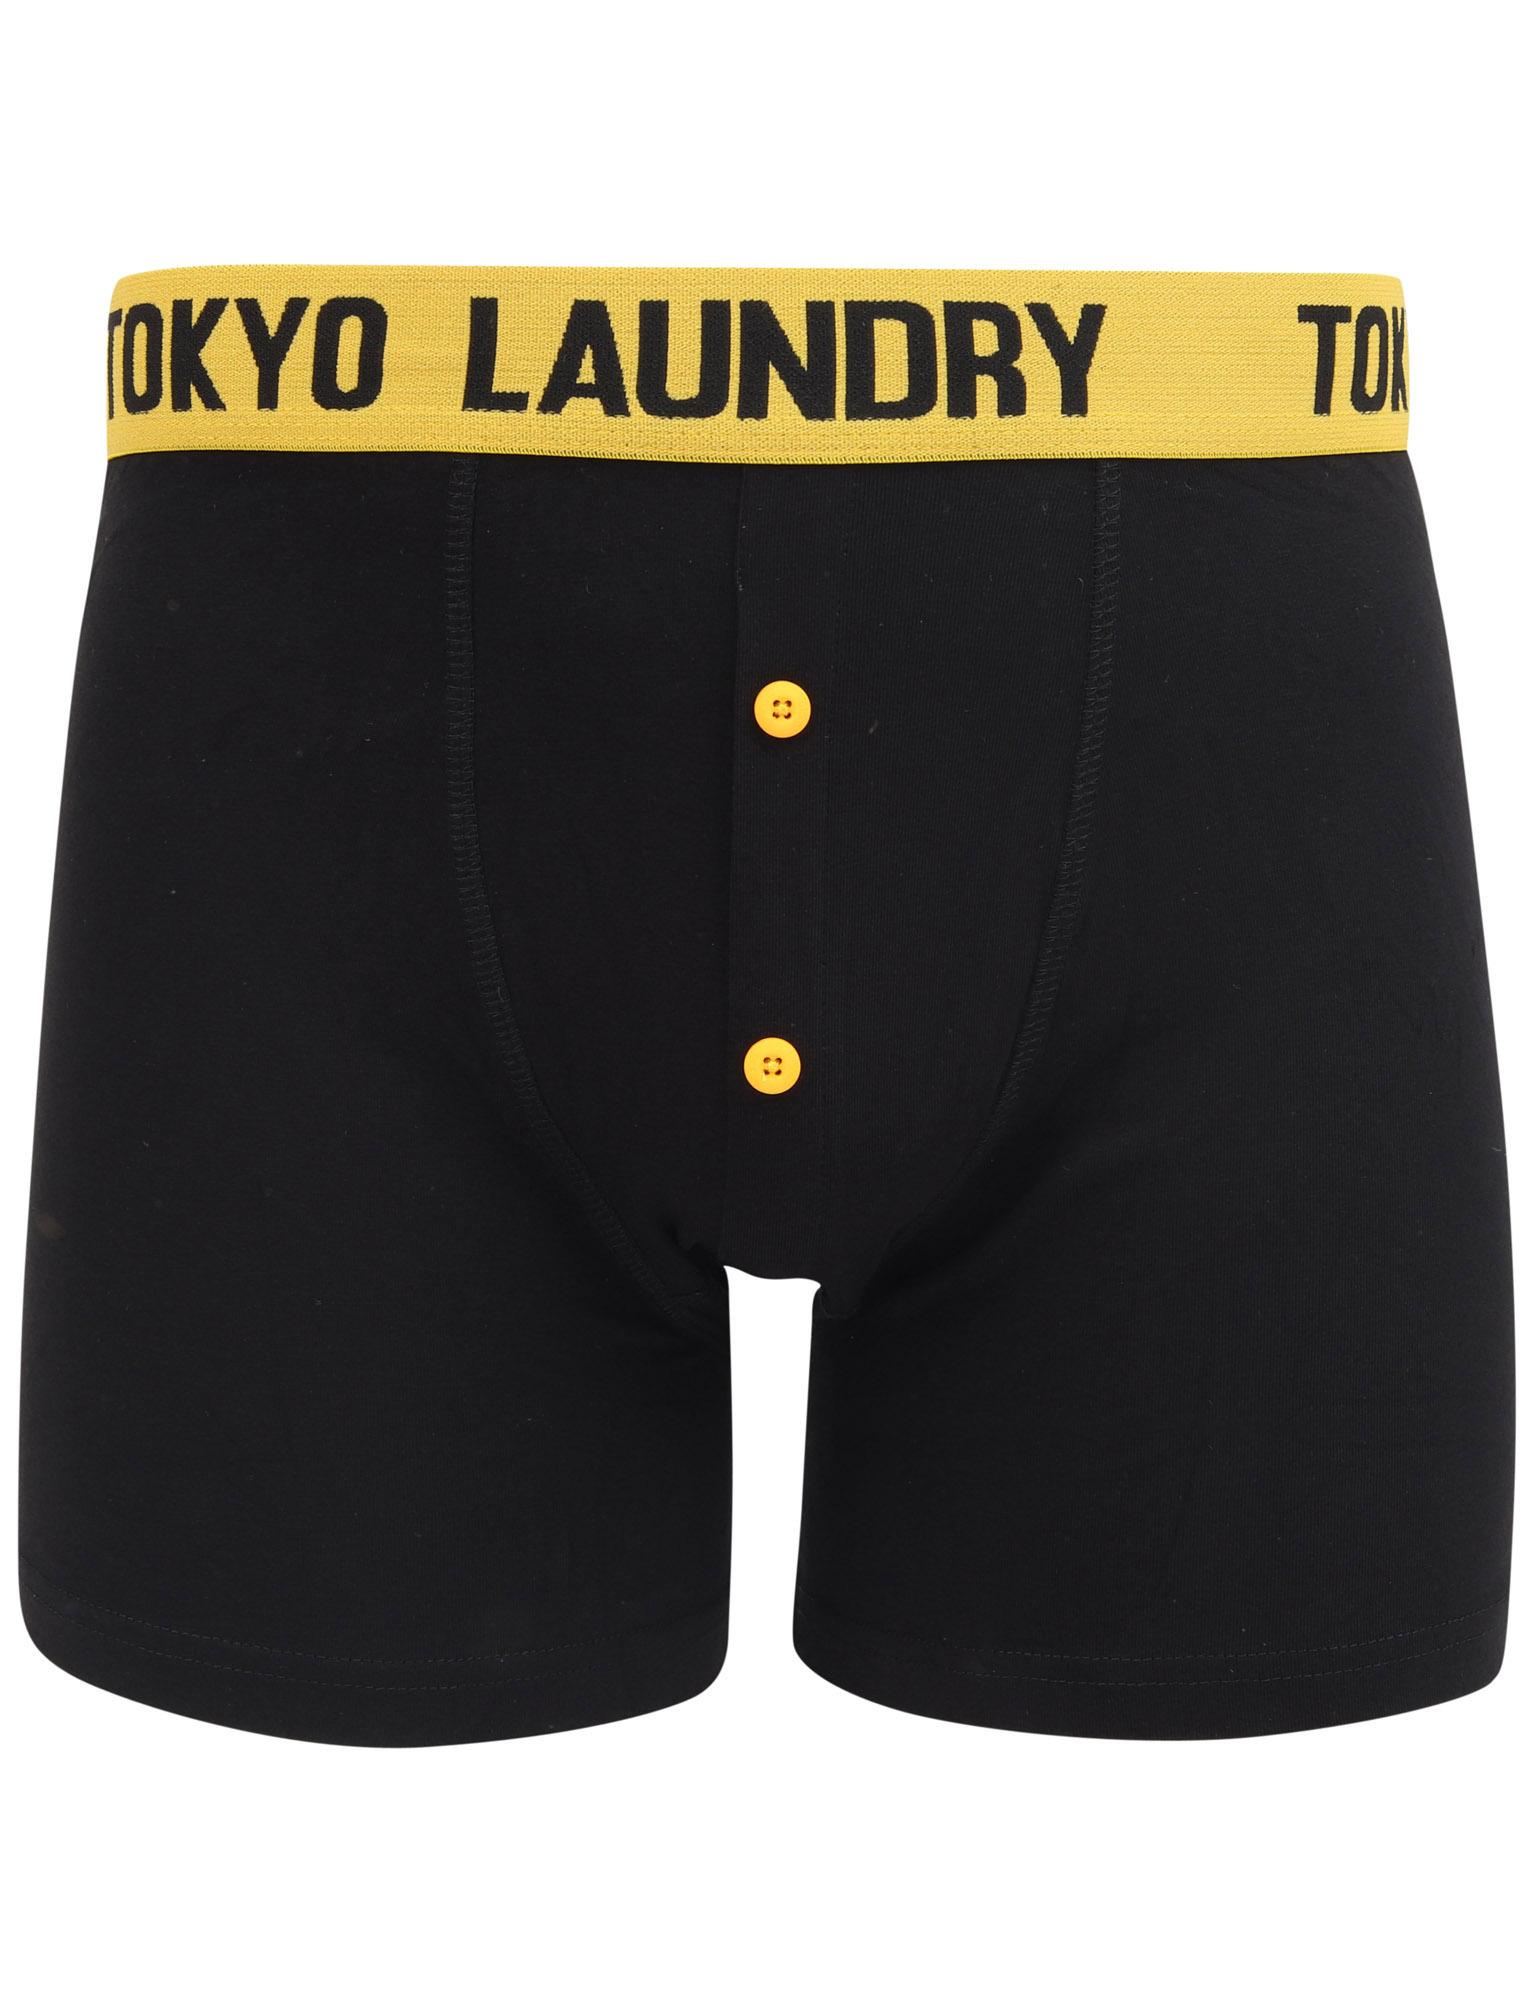 New-Mens-Tokyo-Laundry-2-Pack-Buttoned-Cotton-Rich-Boxer-Shorts-Set-Size-S-XXL thumbnail 18